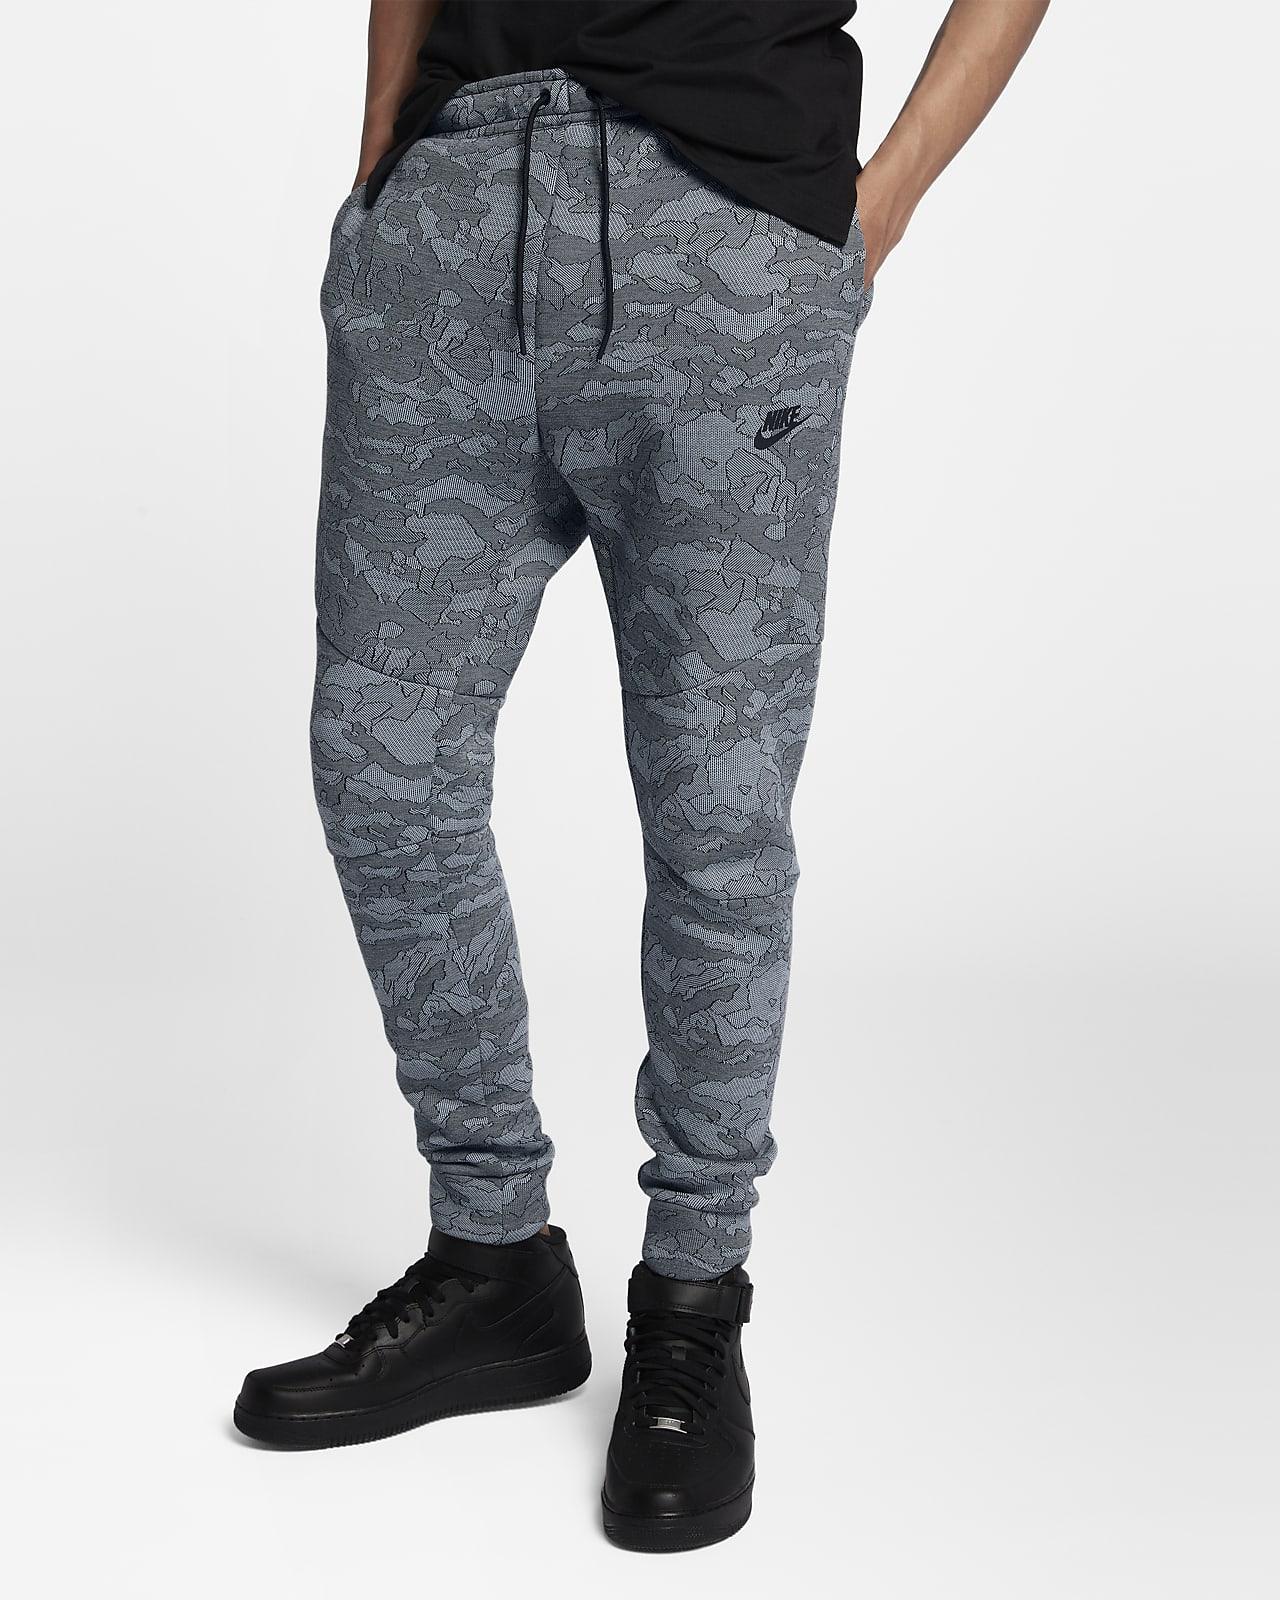 conjunción Ritual Miguel Ángel  Pantalon Nike Sportswear Tech Fleece pour Homme. Nike MA